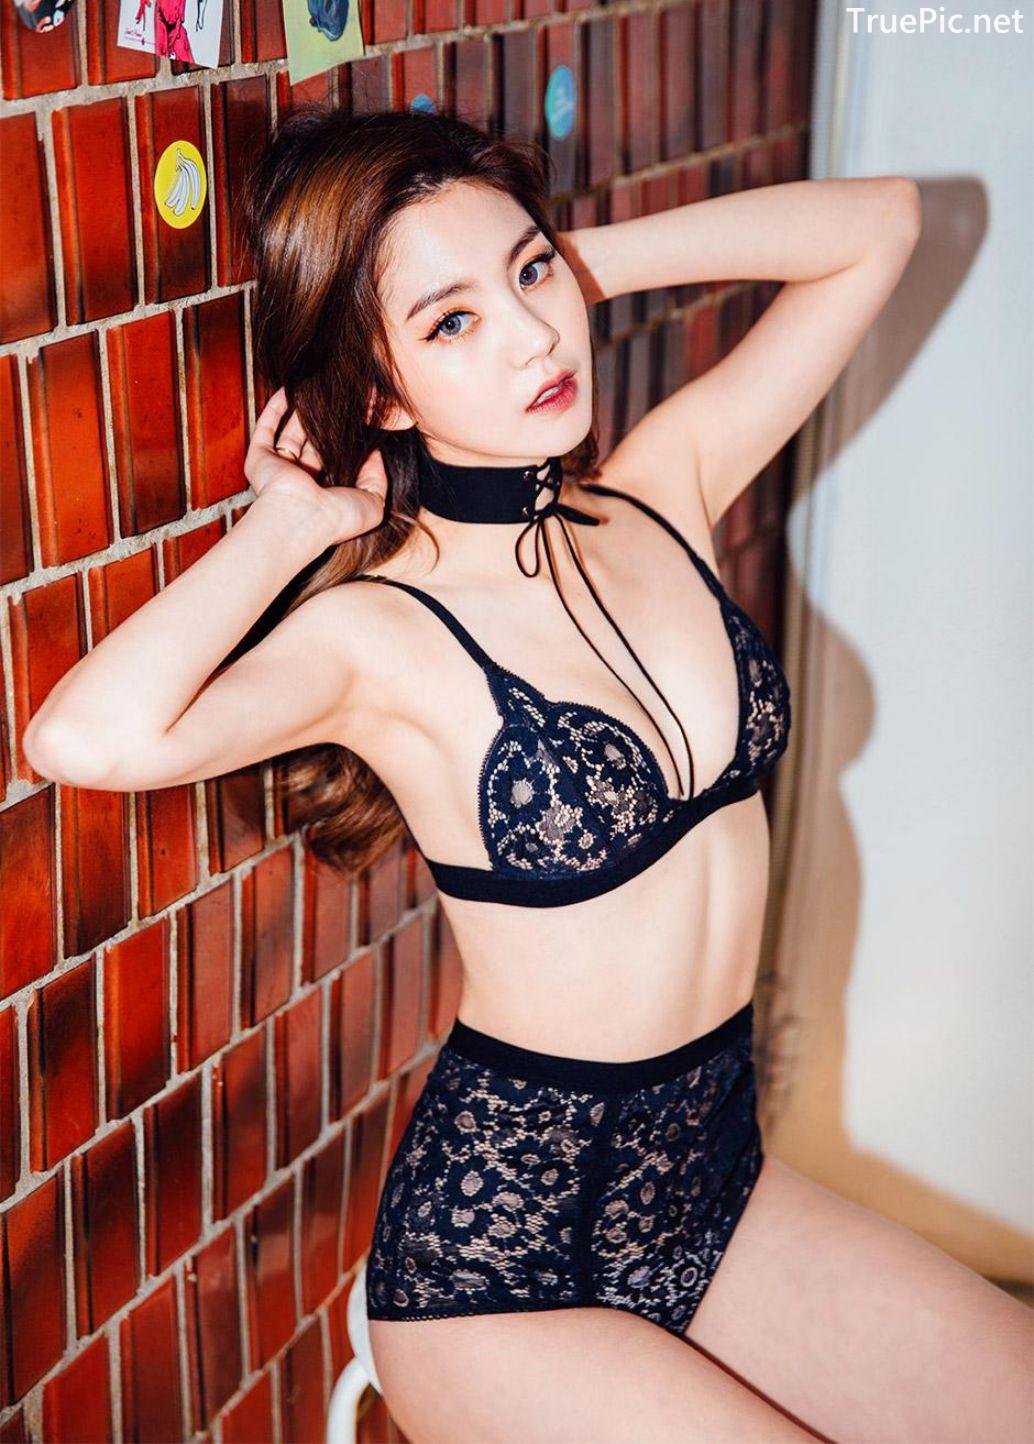 Image-Korean-Fashion-Model–Lee-Chae-Eun–For-Love-and-Lemons-Lingerie-Set-TruePic.net- Picture-5